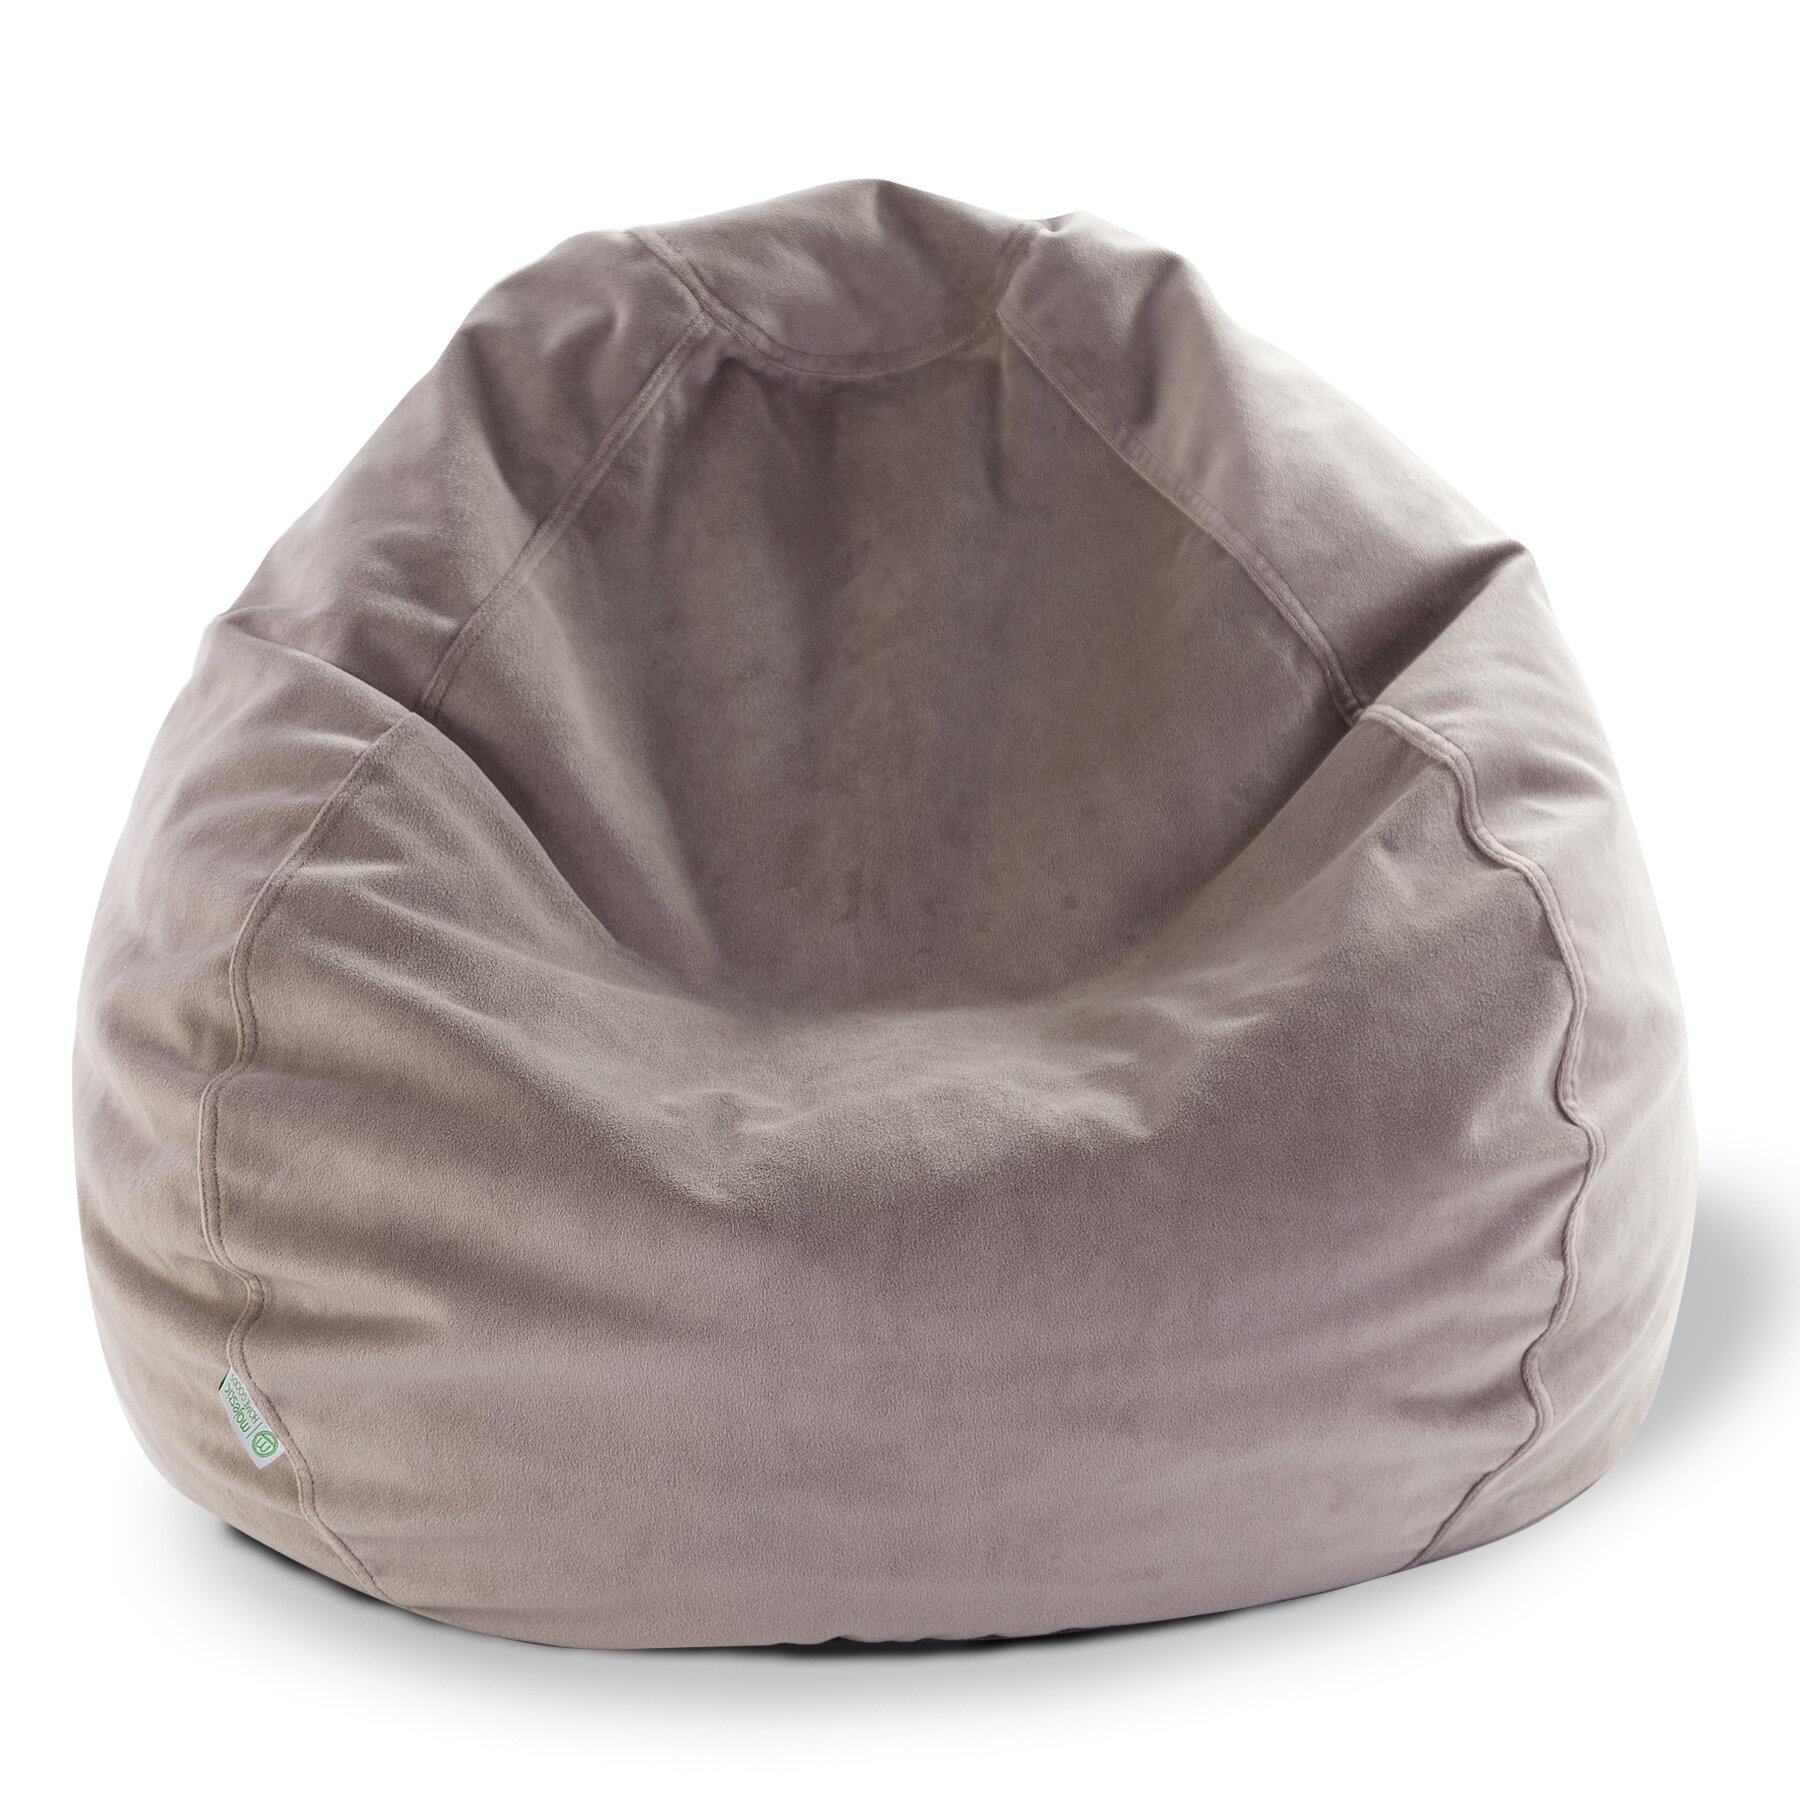 Majestic Home Goods Bean Bag Chair U0026 Reviews | Wayfair